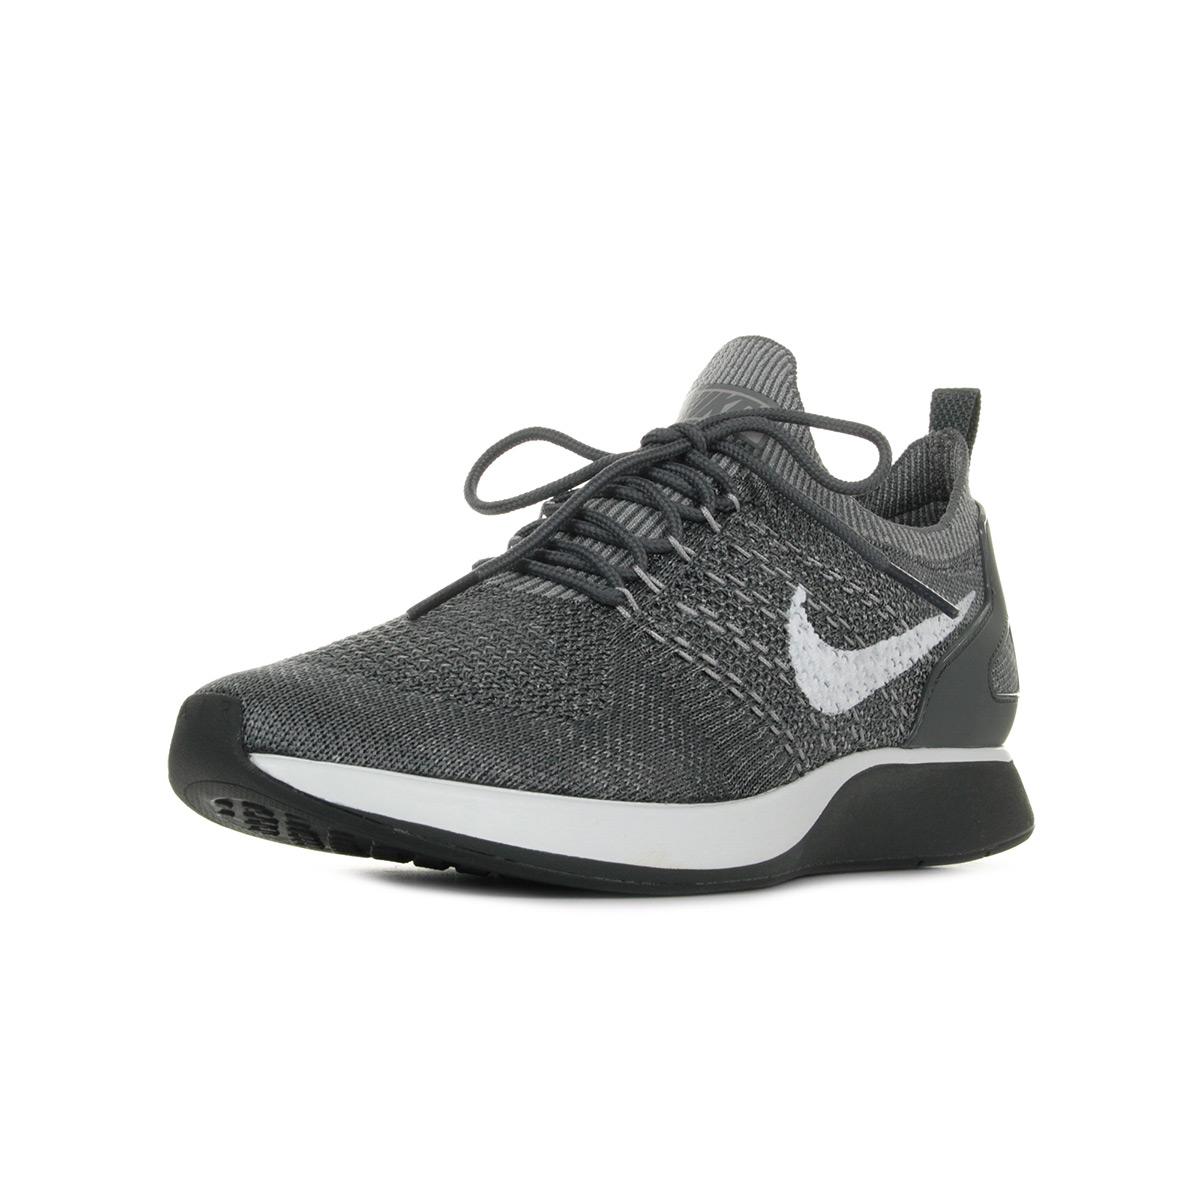 timeless design 577ac ee1e3 Nike Air Zoom Mariah flyknit Racer Shoe ...